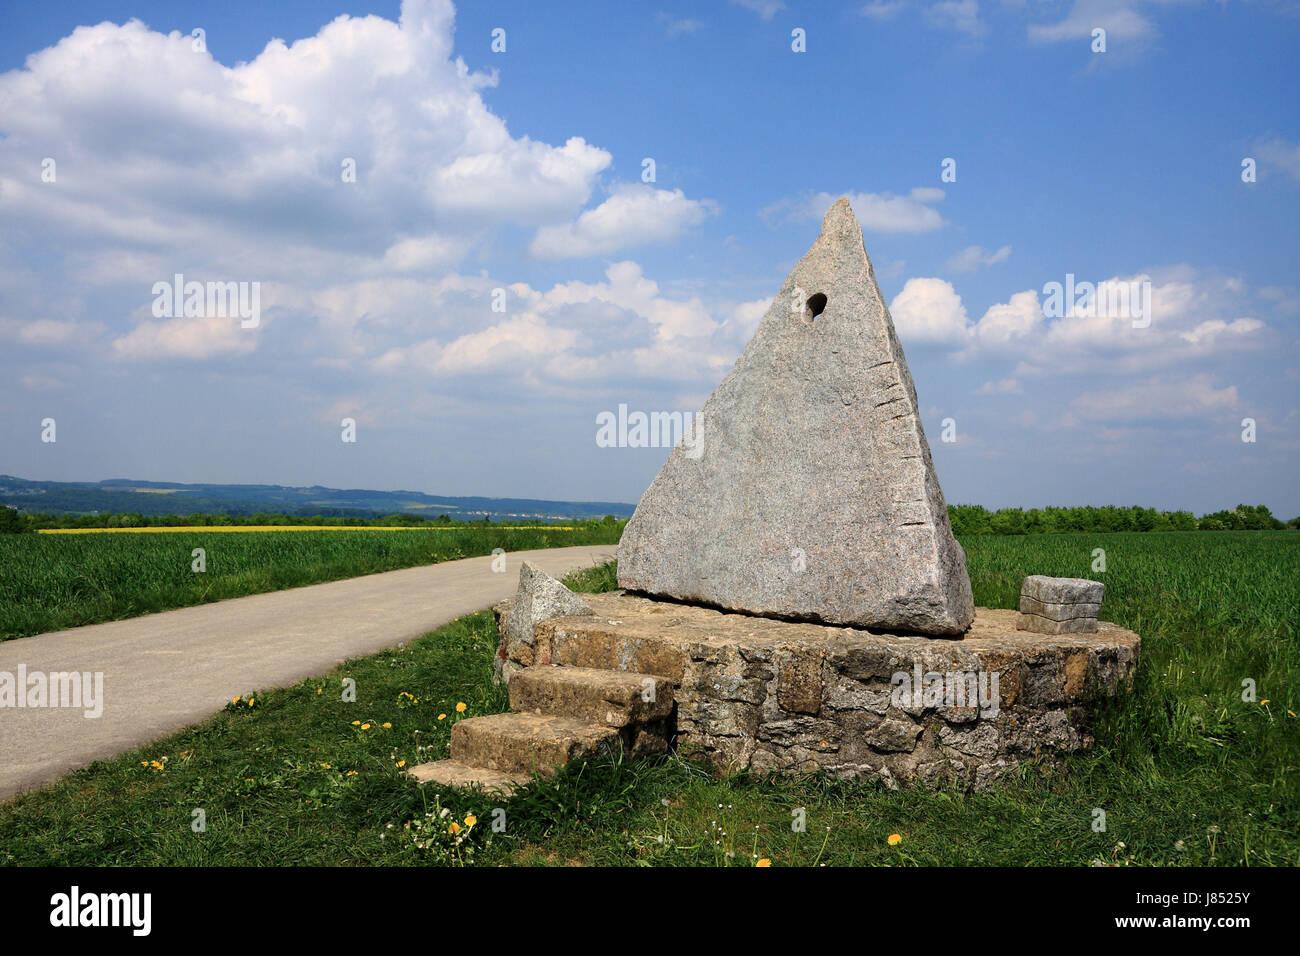 Treppen Saarland blaue skulptur pyramide saarland künstlerische firmament himmelblau